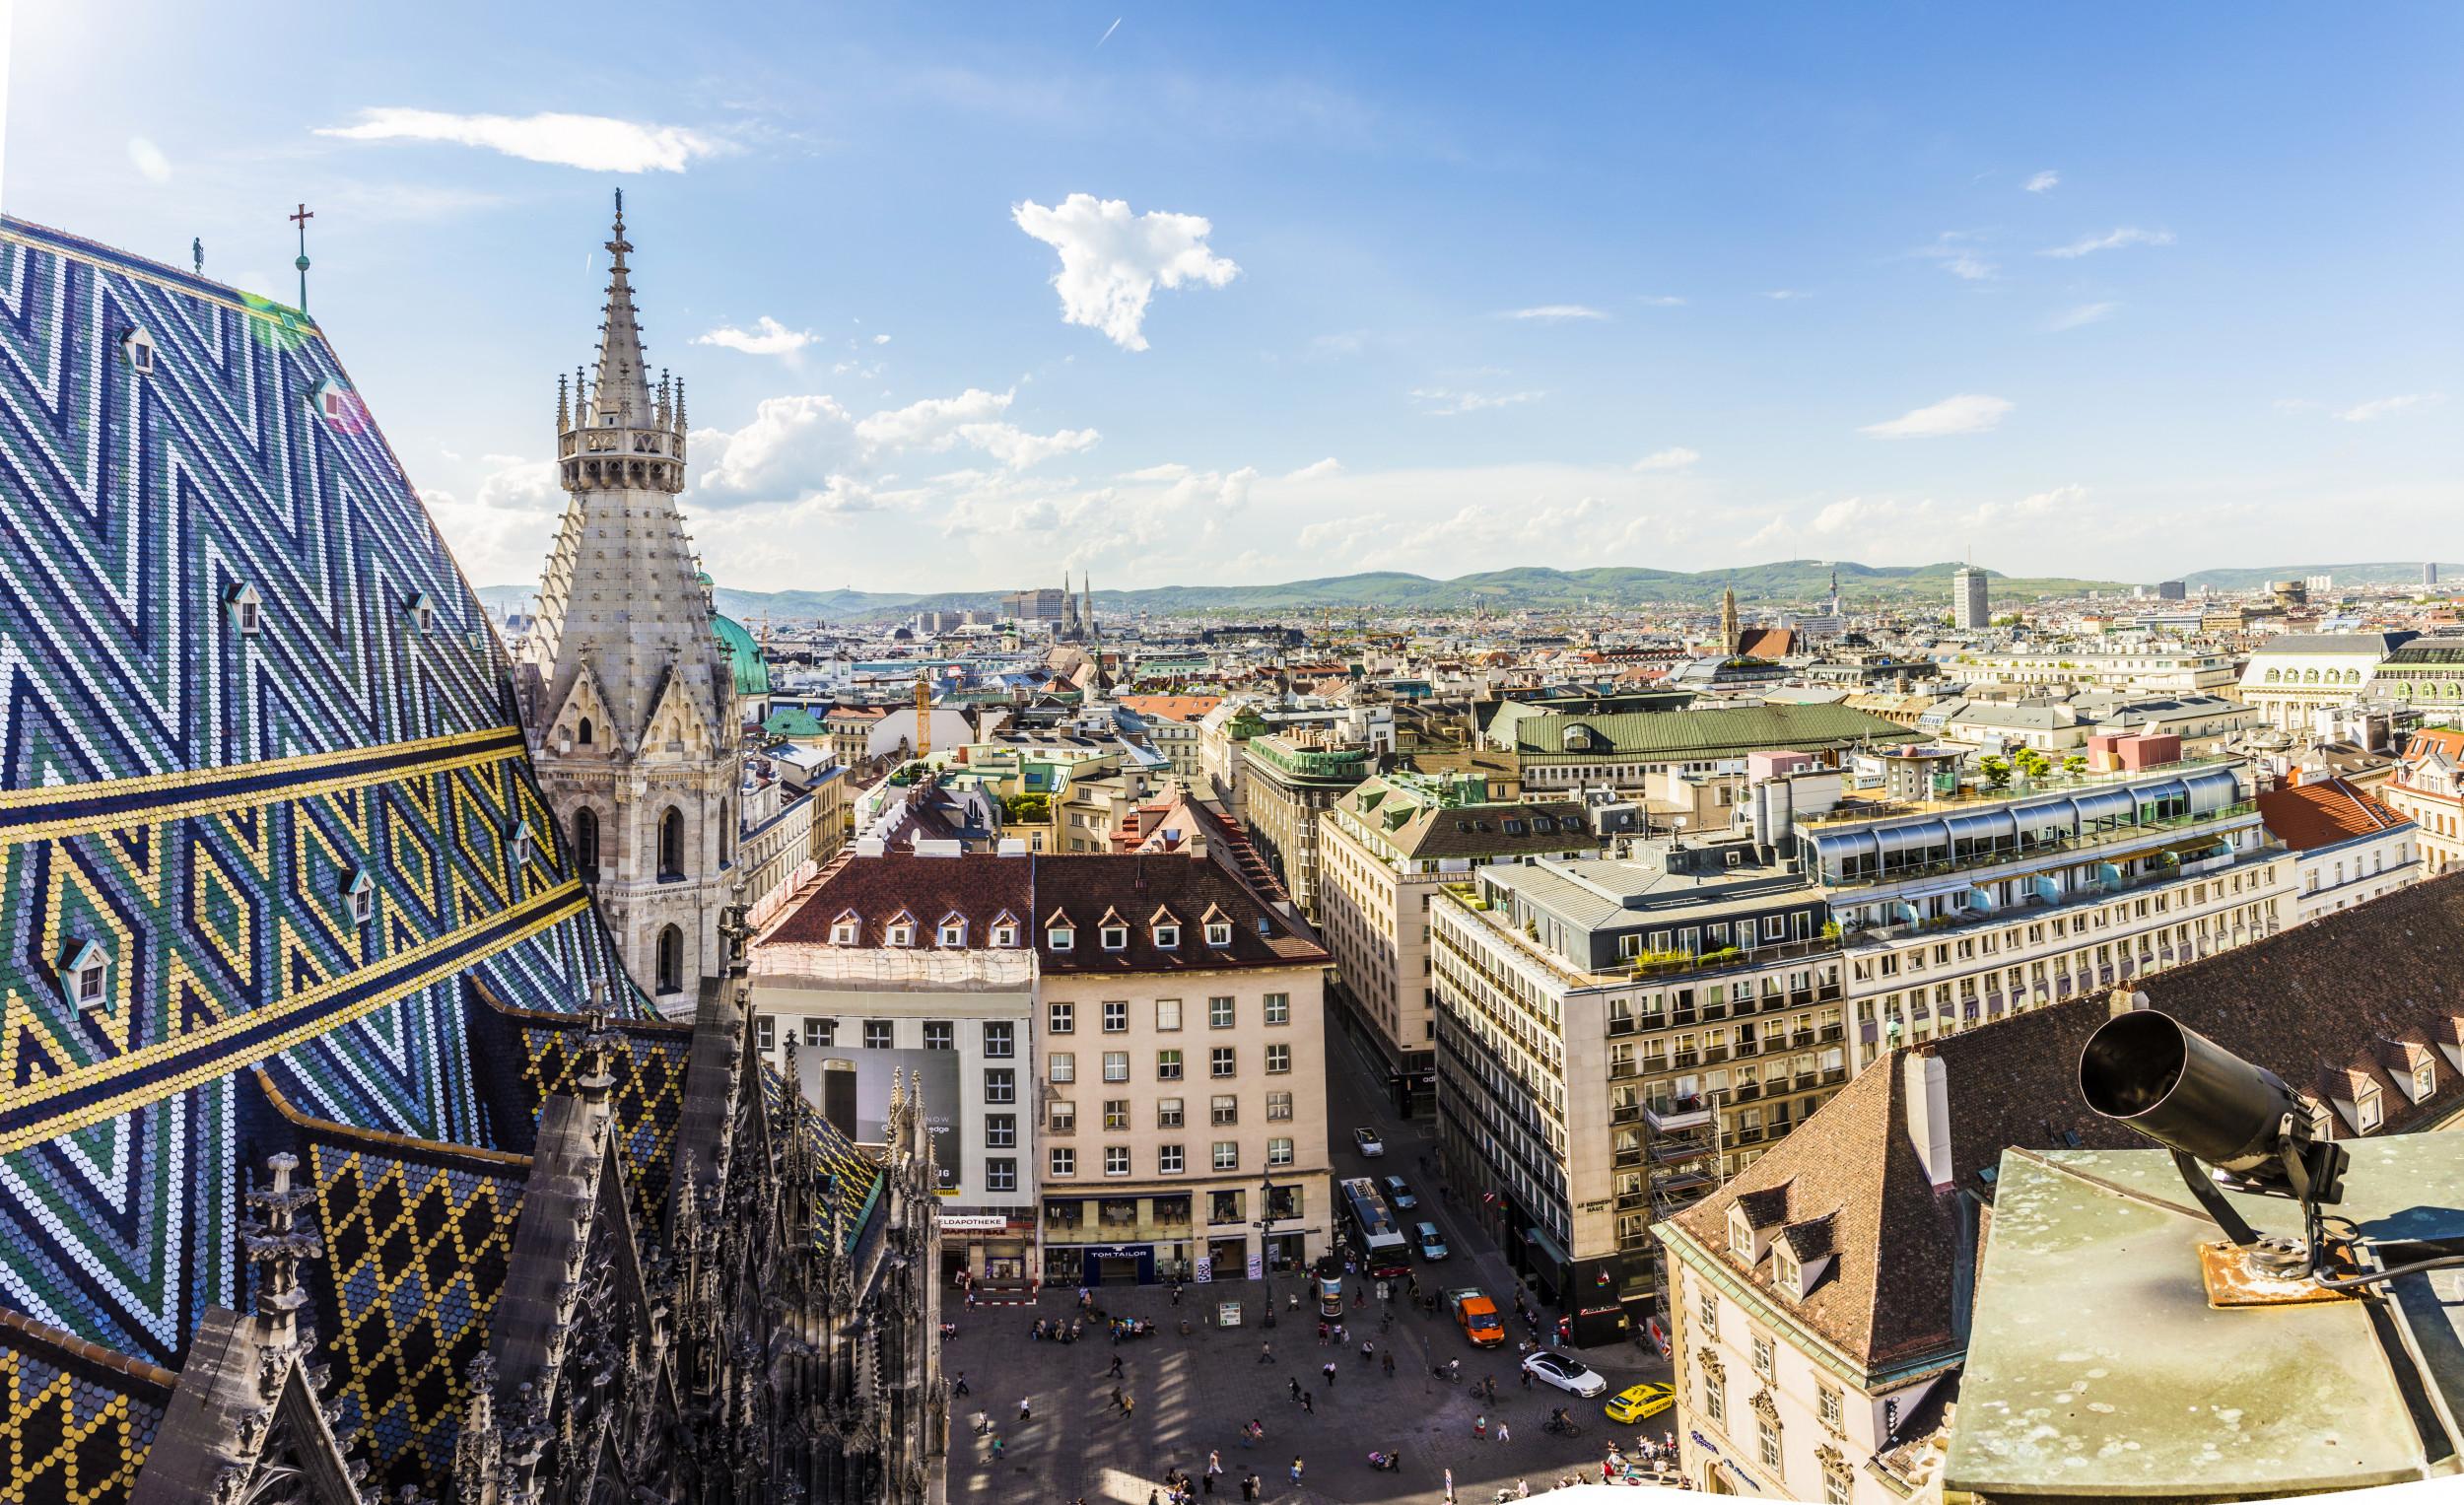 FE_SmartCities_ViennaAustria_473272184